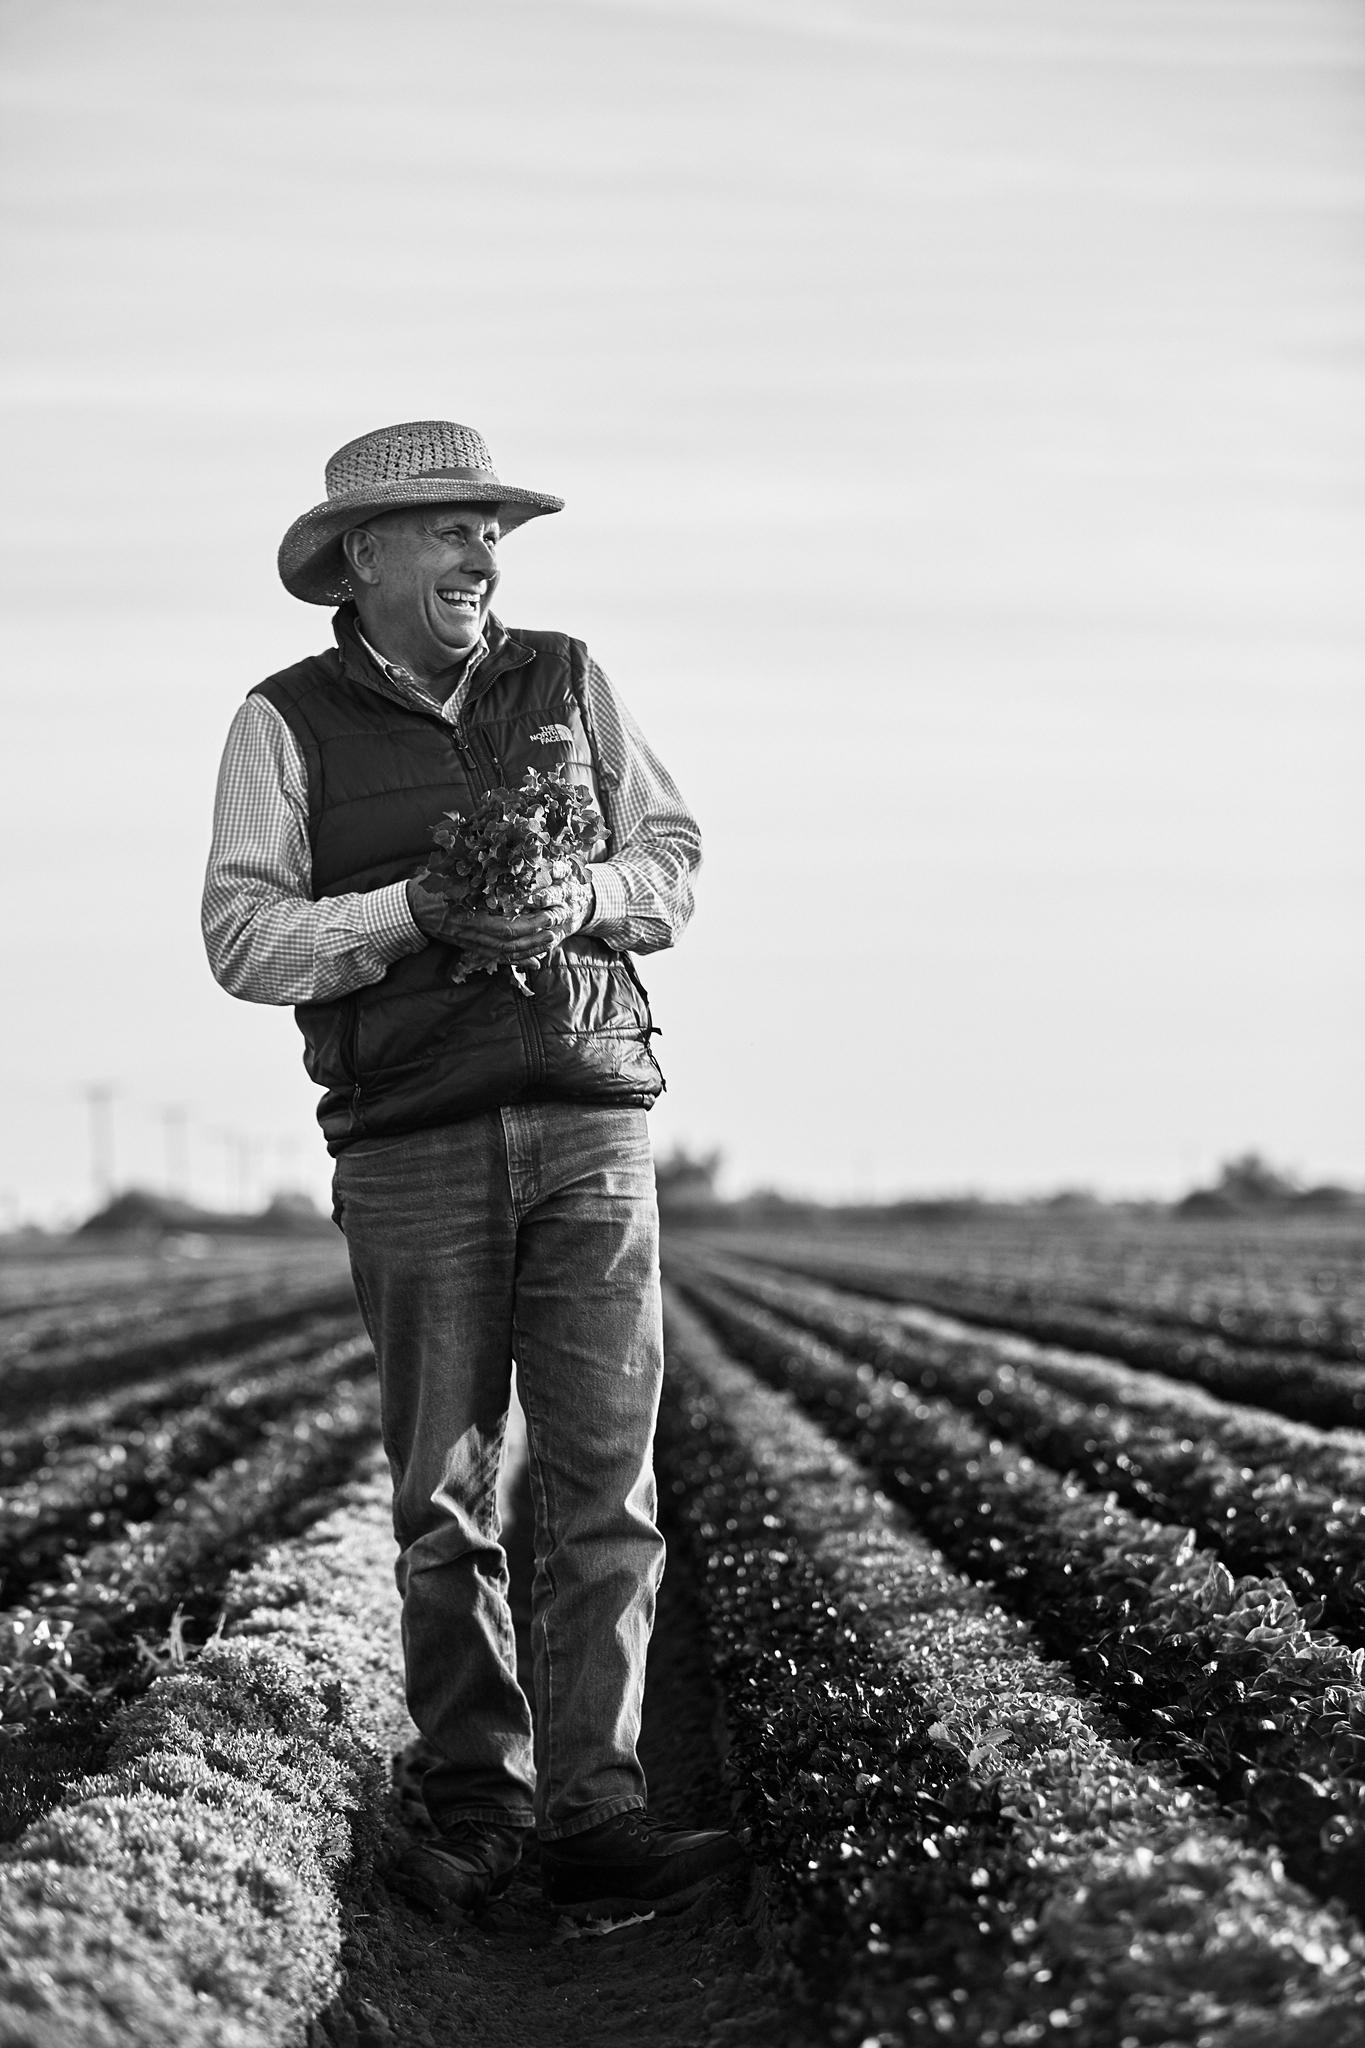 Phoenix Editorial Photographer - EatingWell Magazine Tastemakers - Steve Alameda - Environmental Portrait